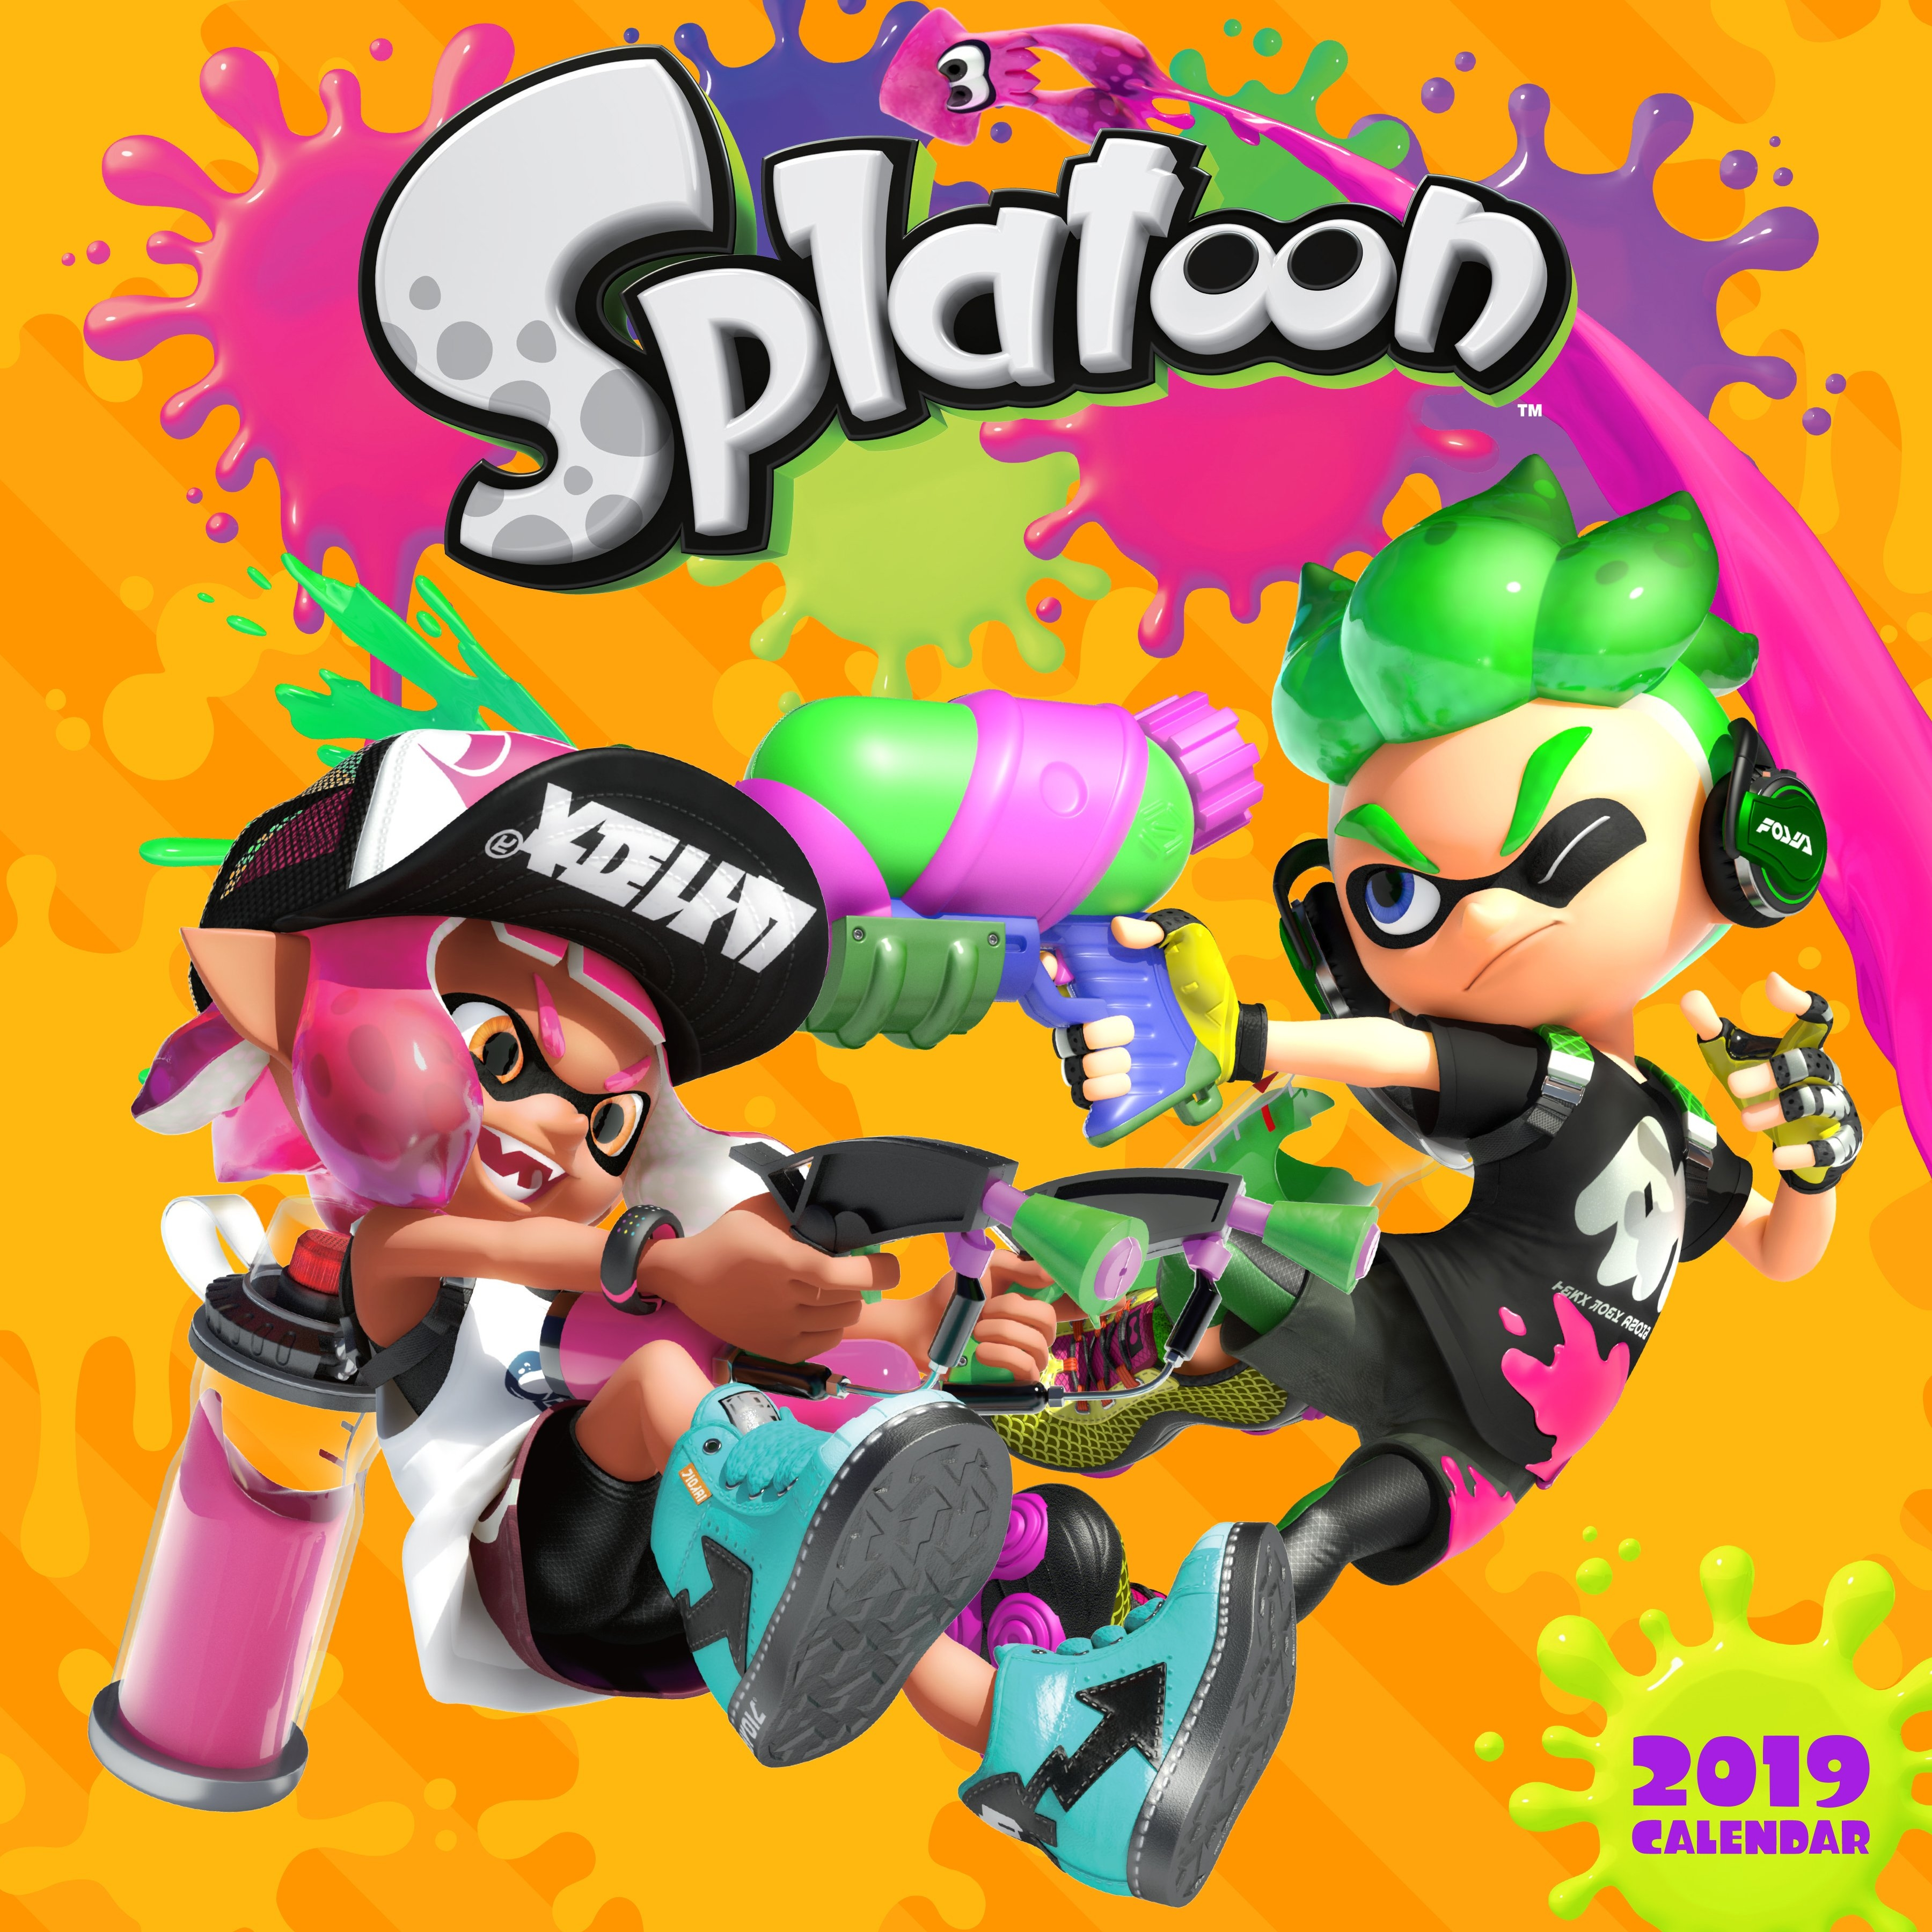 Buy Splatoon 2019 Wall Calendarpokemon With Free Delivery Splatoon 2 Calendar 2019